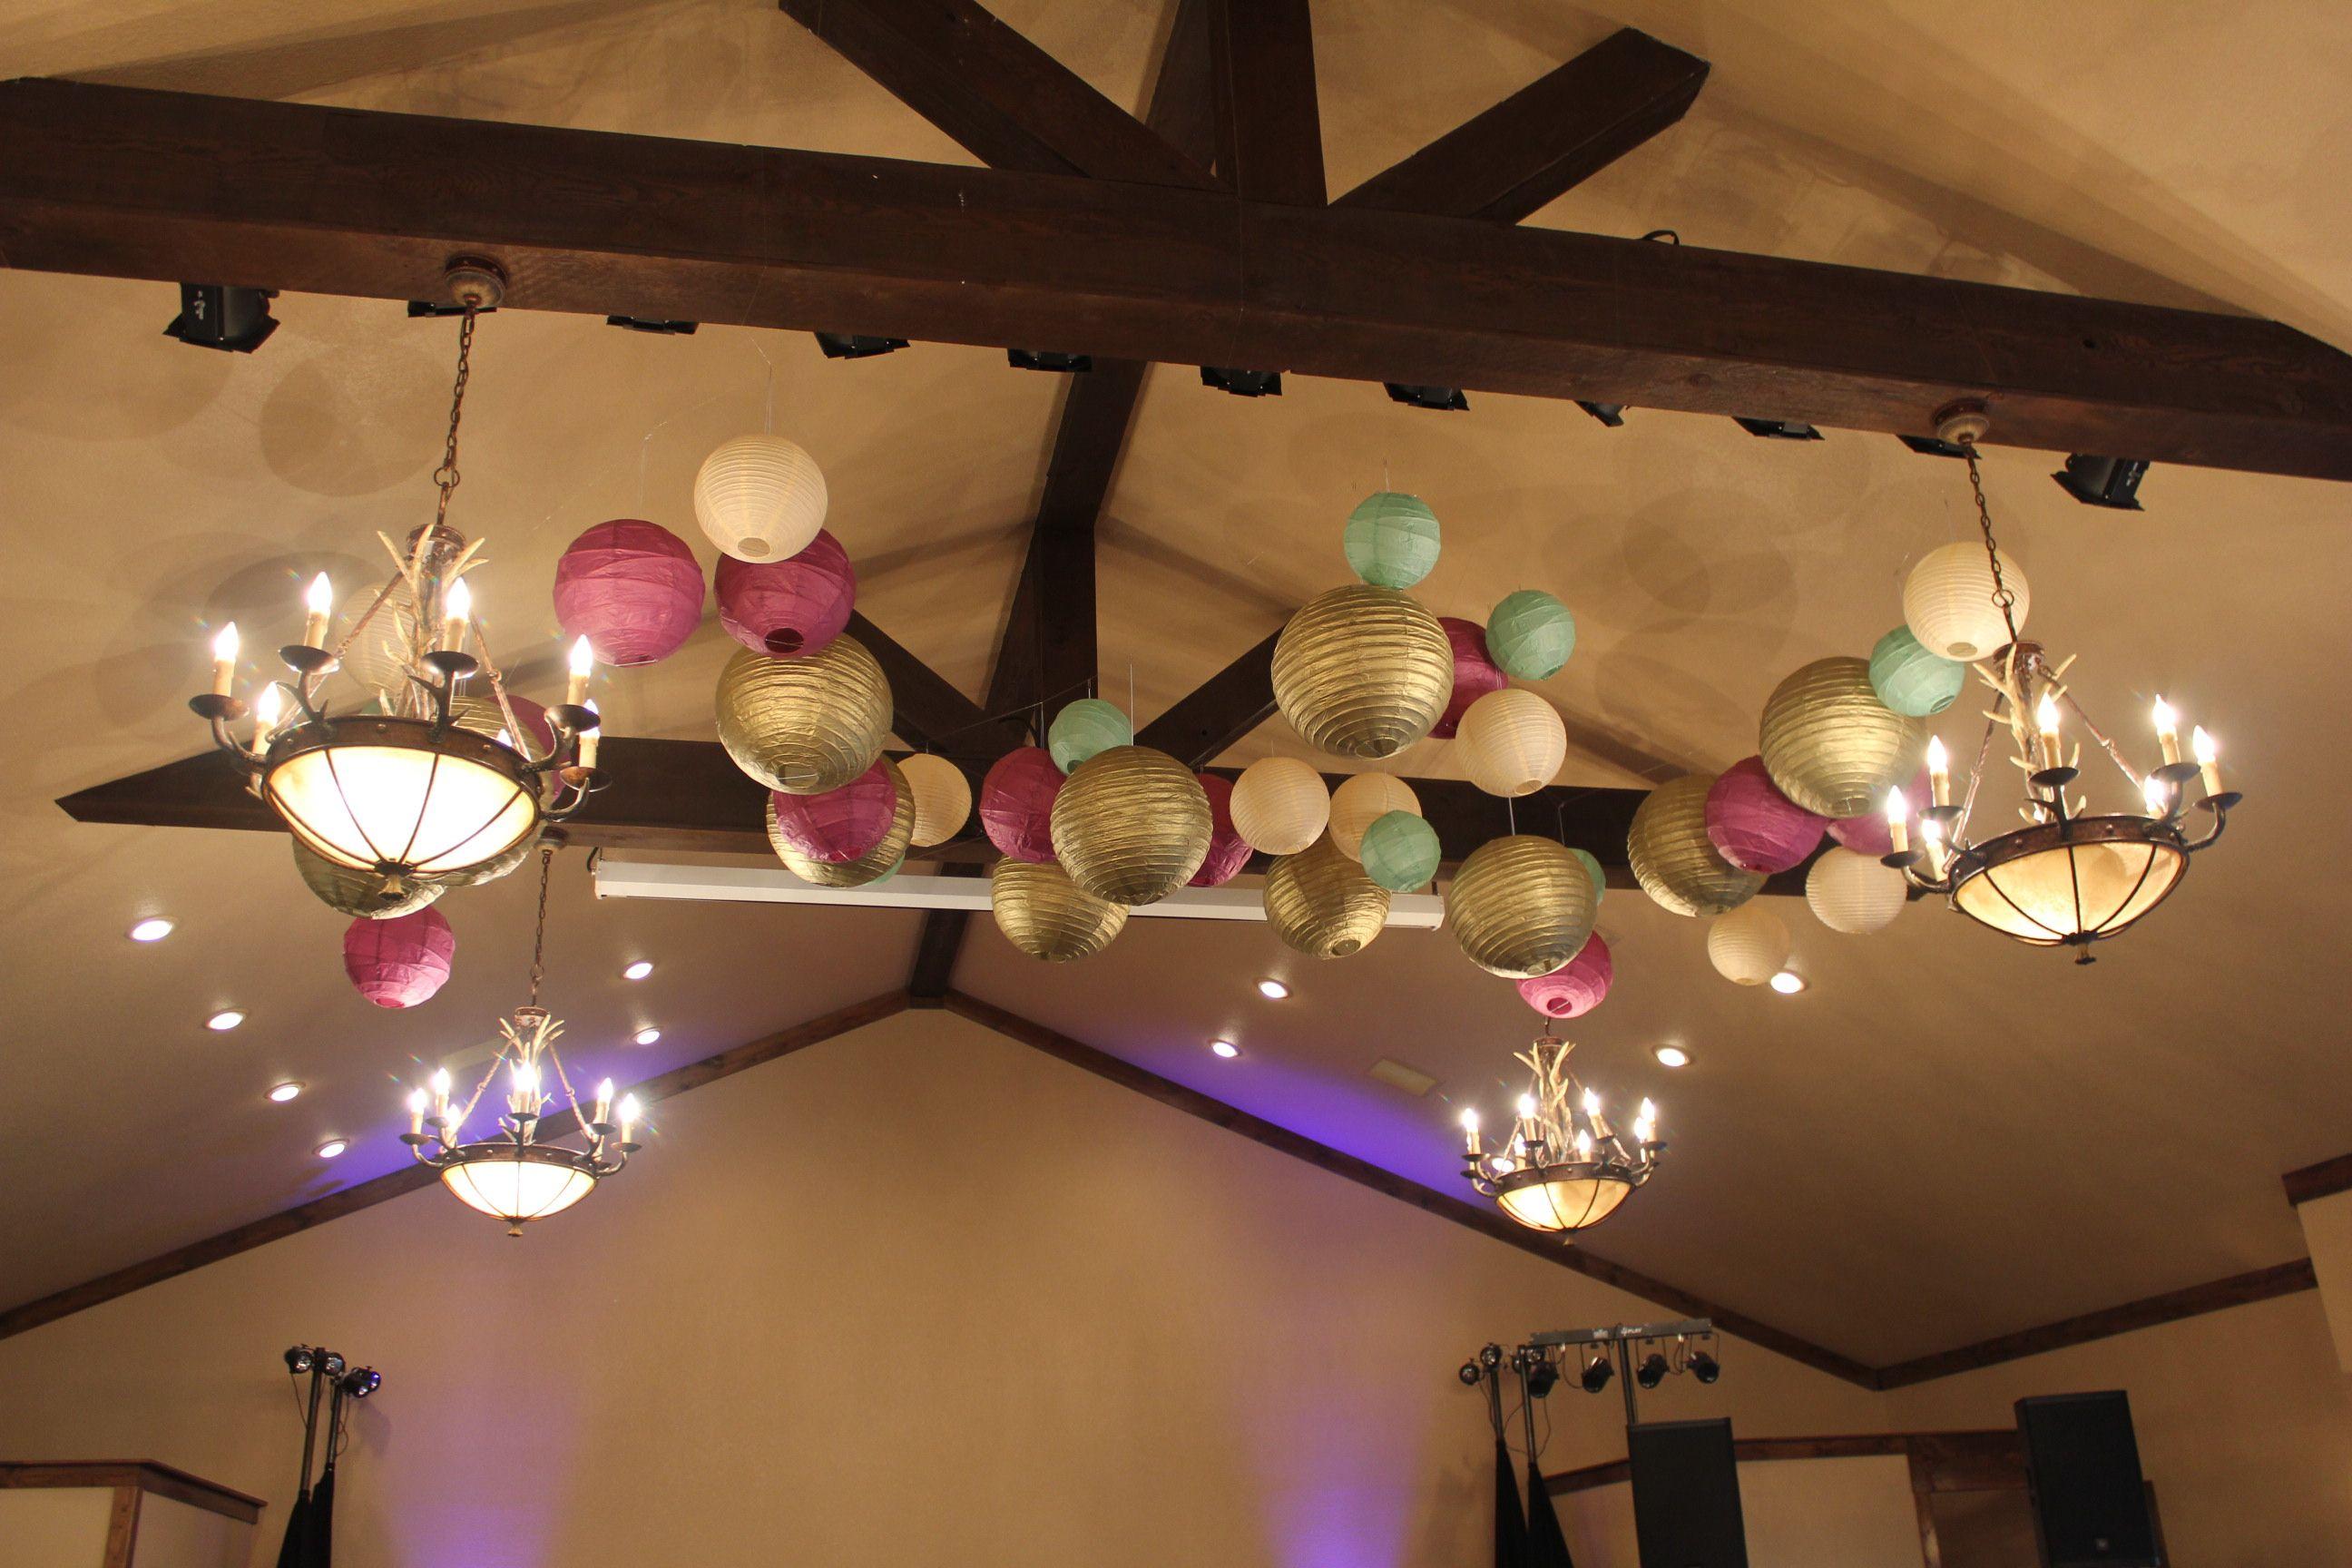 Paper lanterns above the dance floor. Paper lanterns